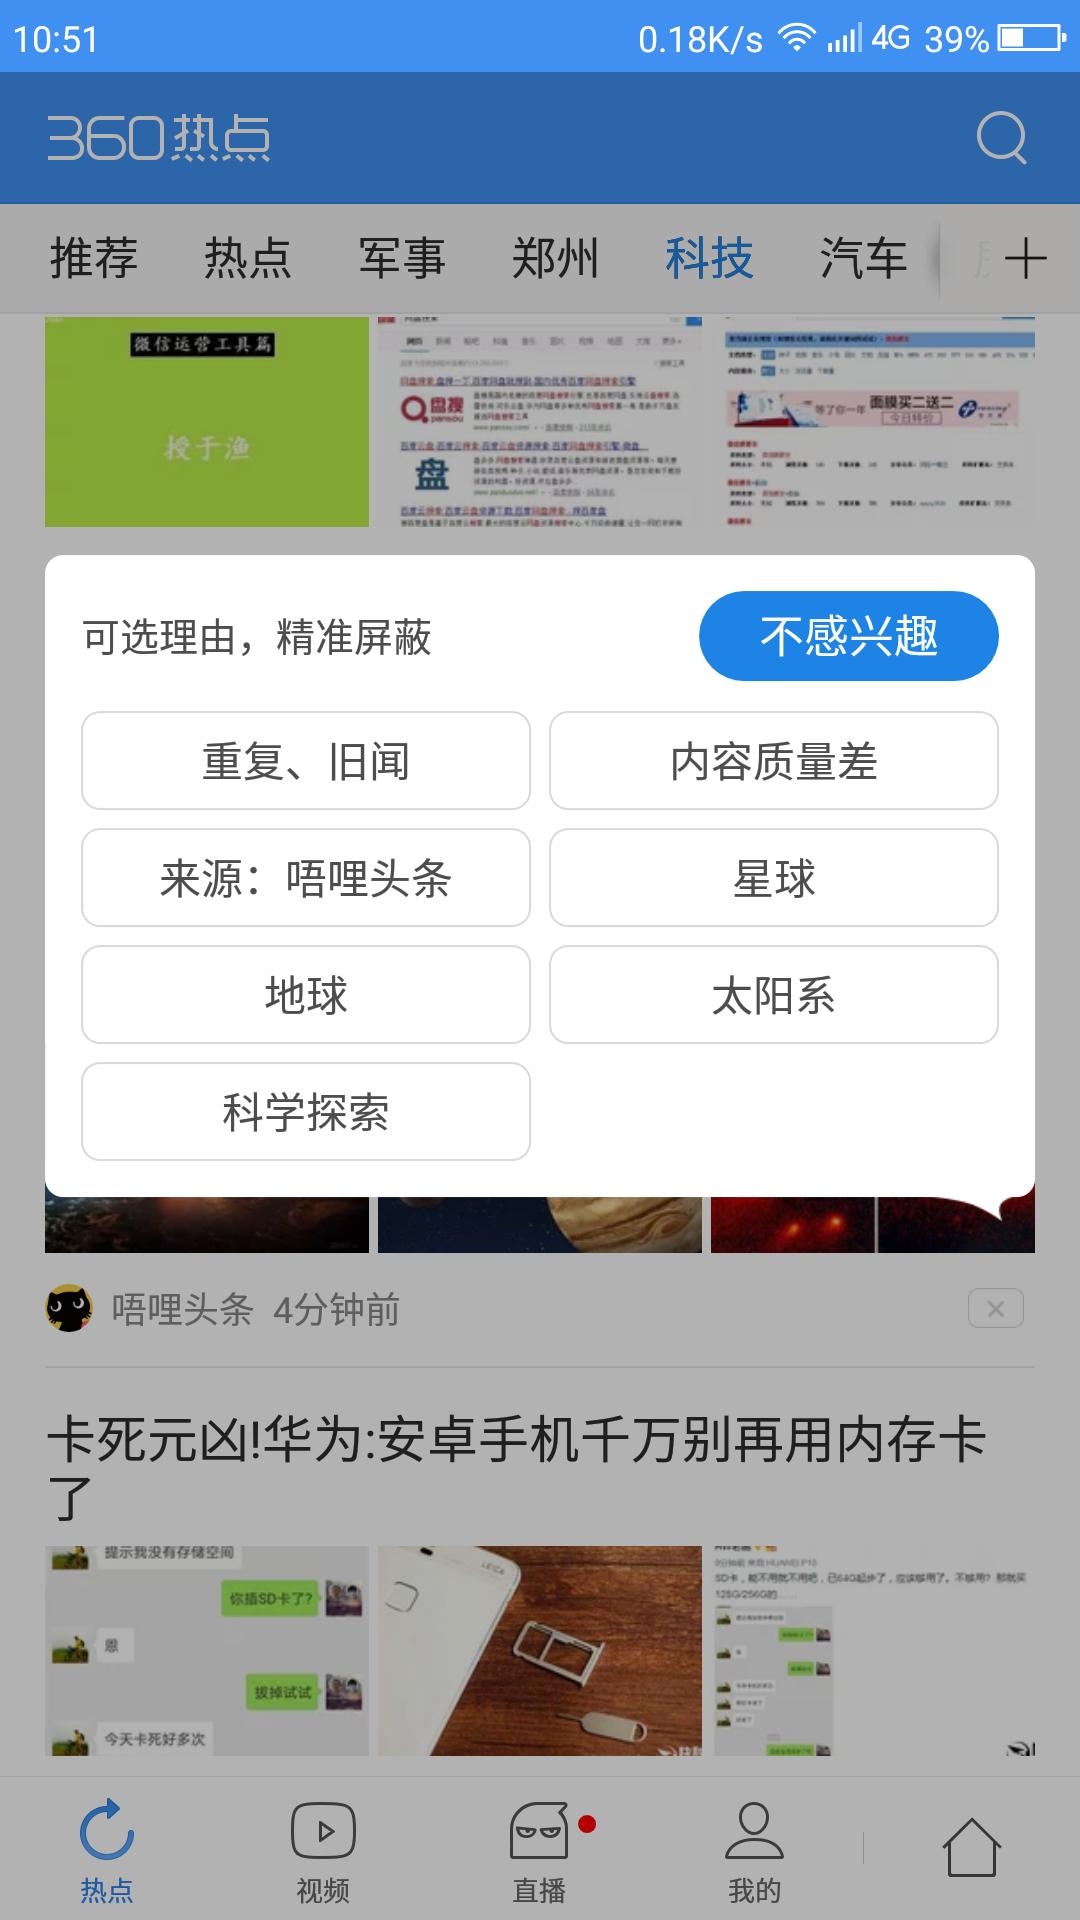 Screenshot_2017-04-02-10-51-33.png